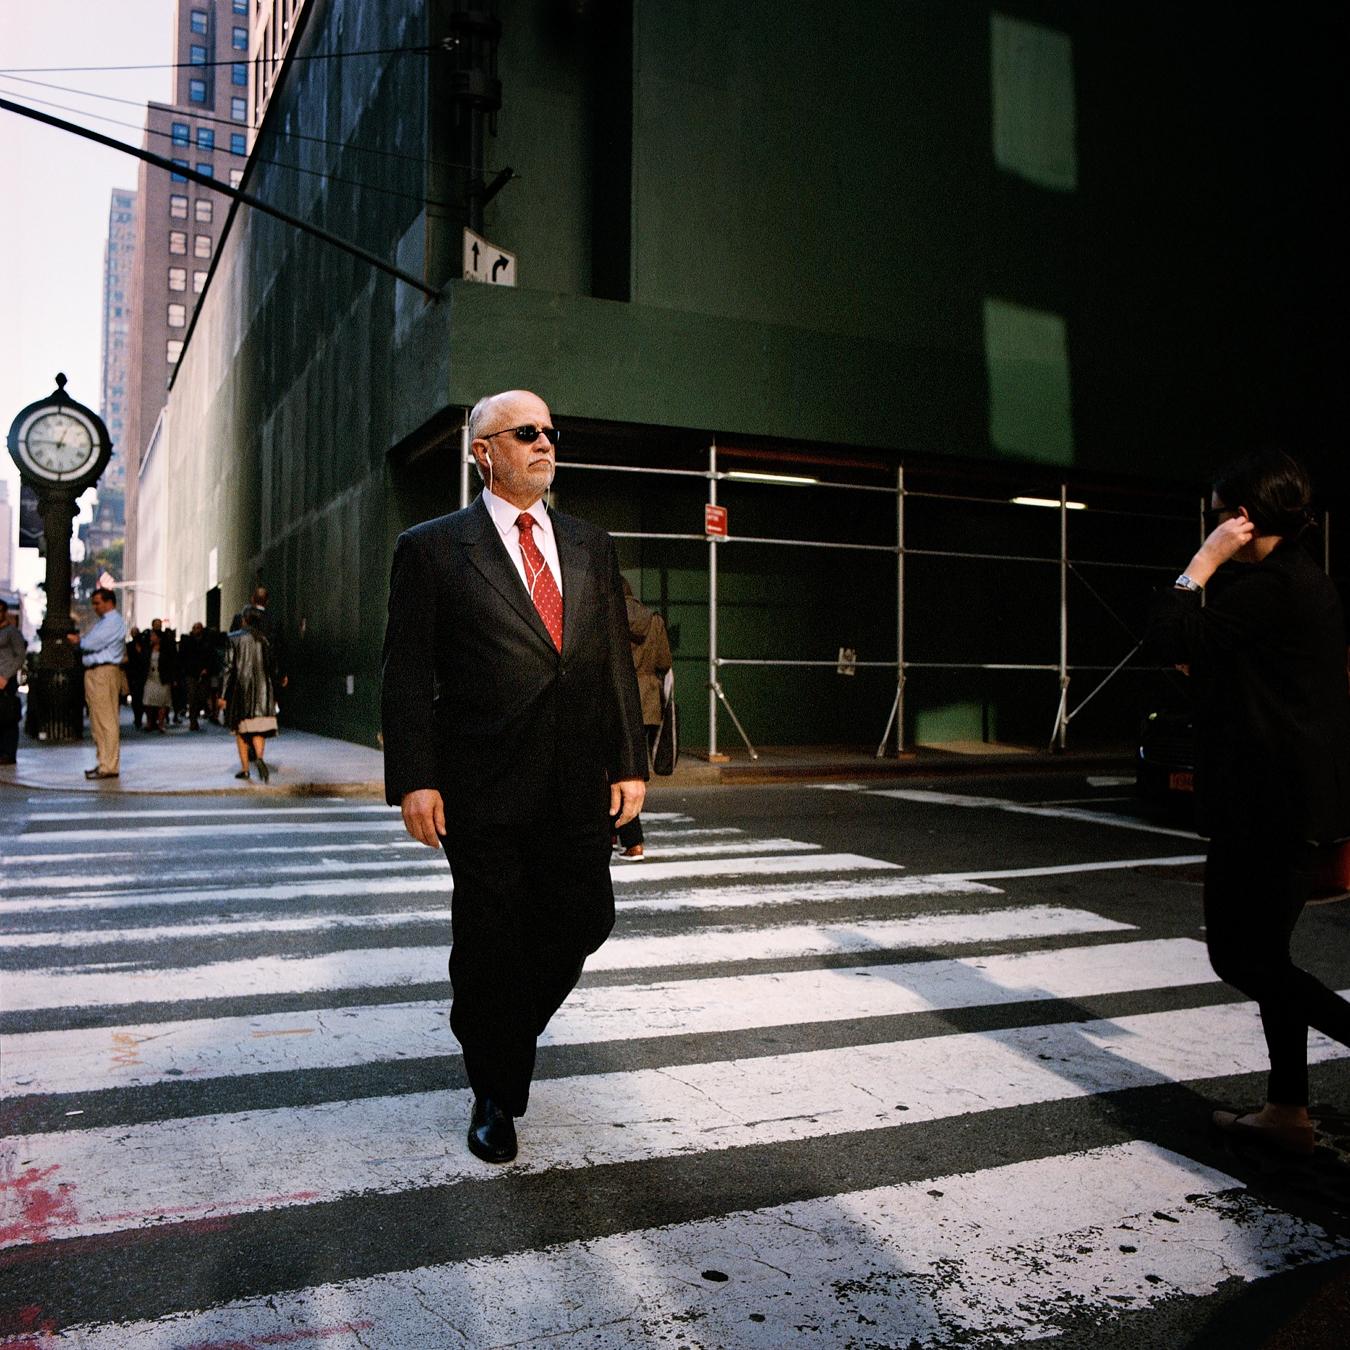 Maud WALAS Street photography NEW YORK 18.jpg